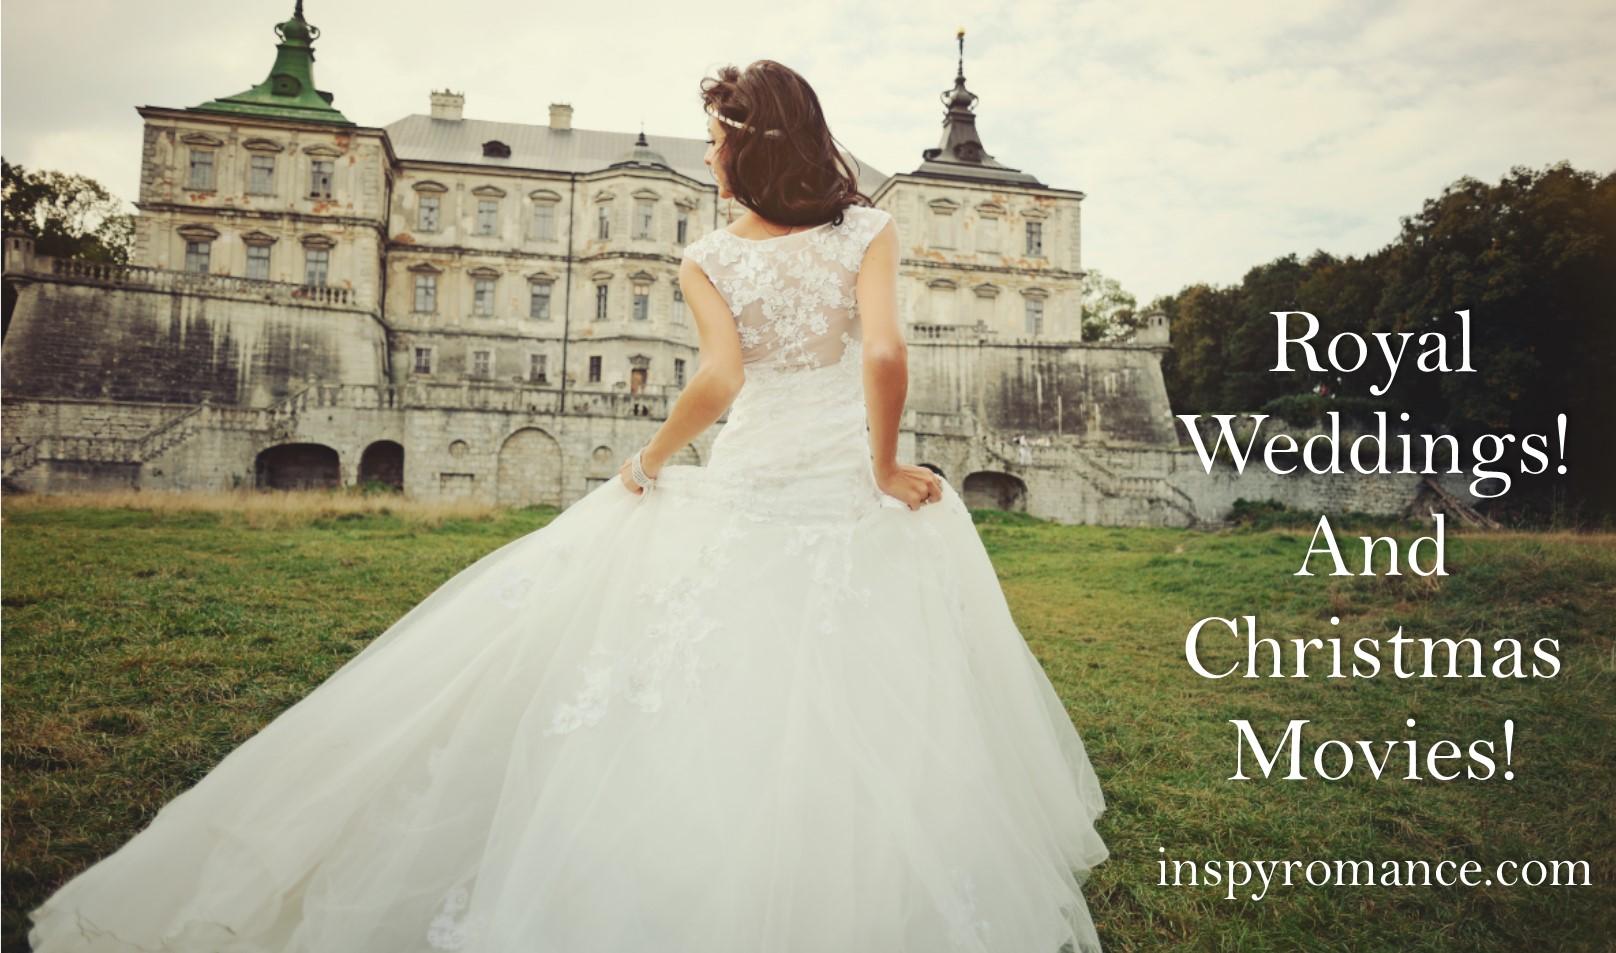 Royal Weddings! And Christmas Movies! And #Giveaway!